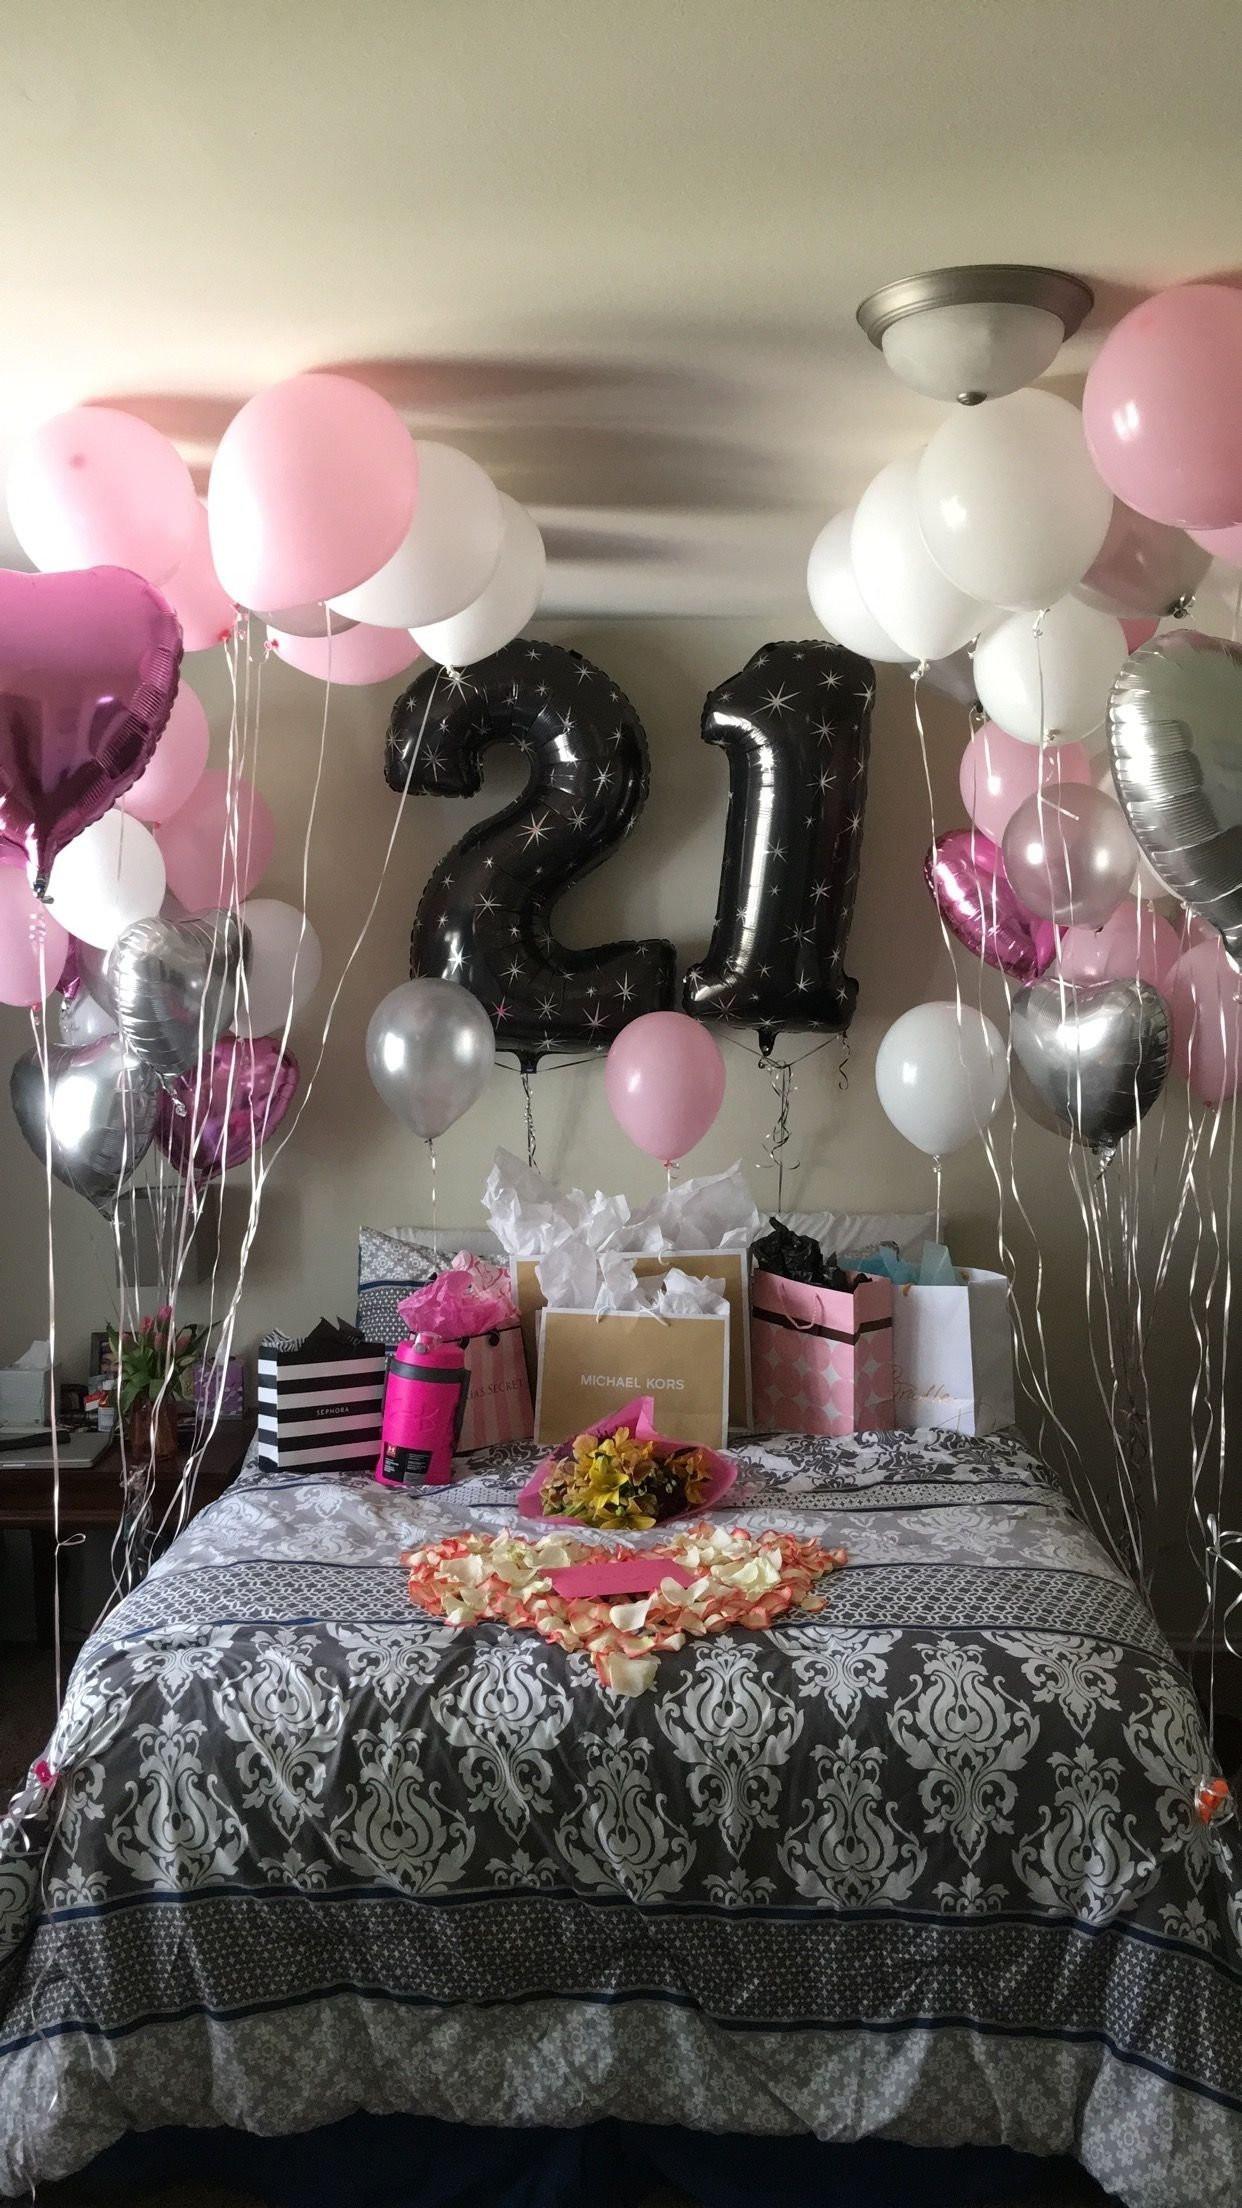 21St Birthday Gift Ideas For Girlfriend  10 Fashionable Birthday Surprise Ideas For Girlfriend 2019